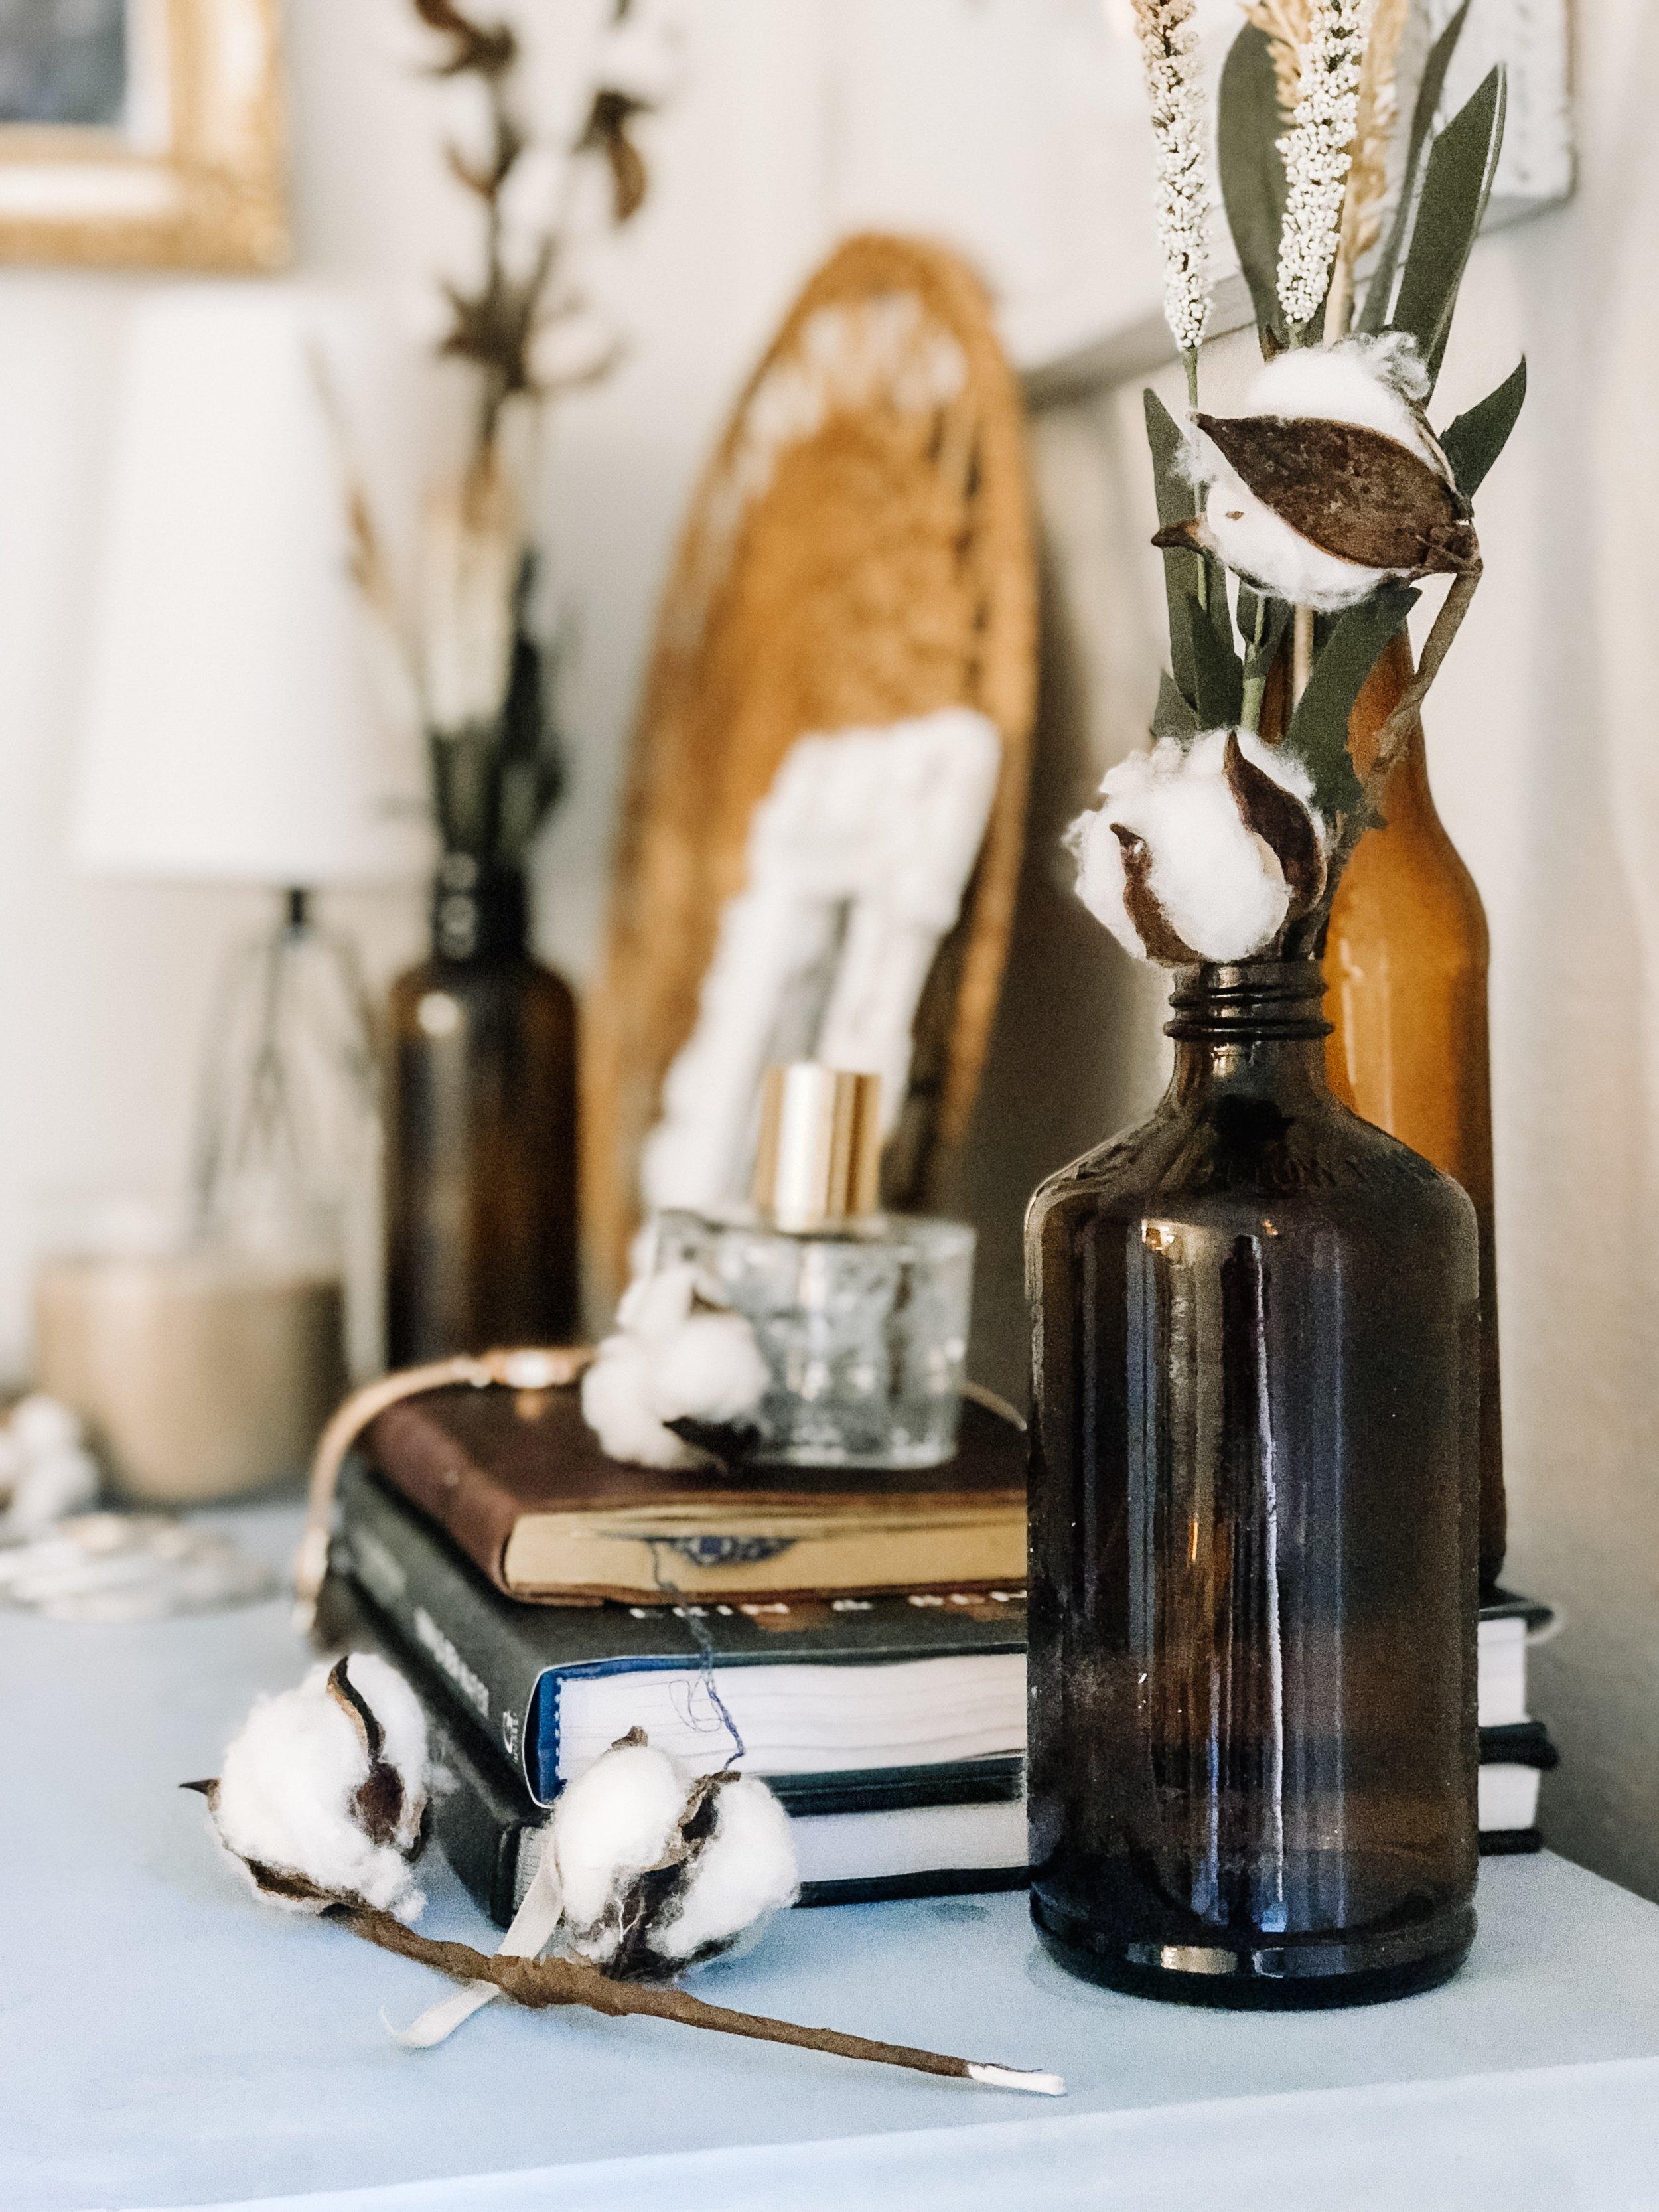 fall-decor-amber-bottles-cotton-stems-5